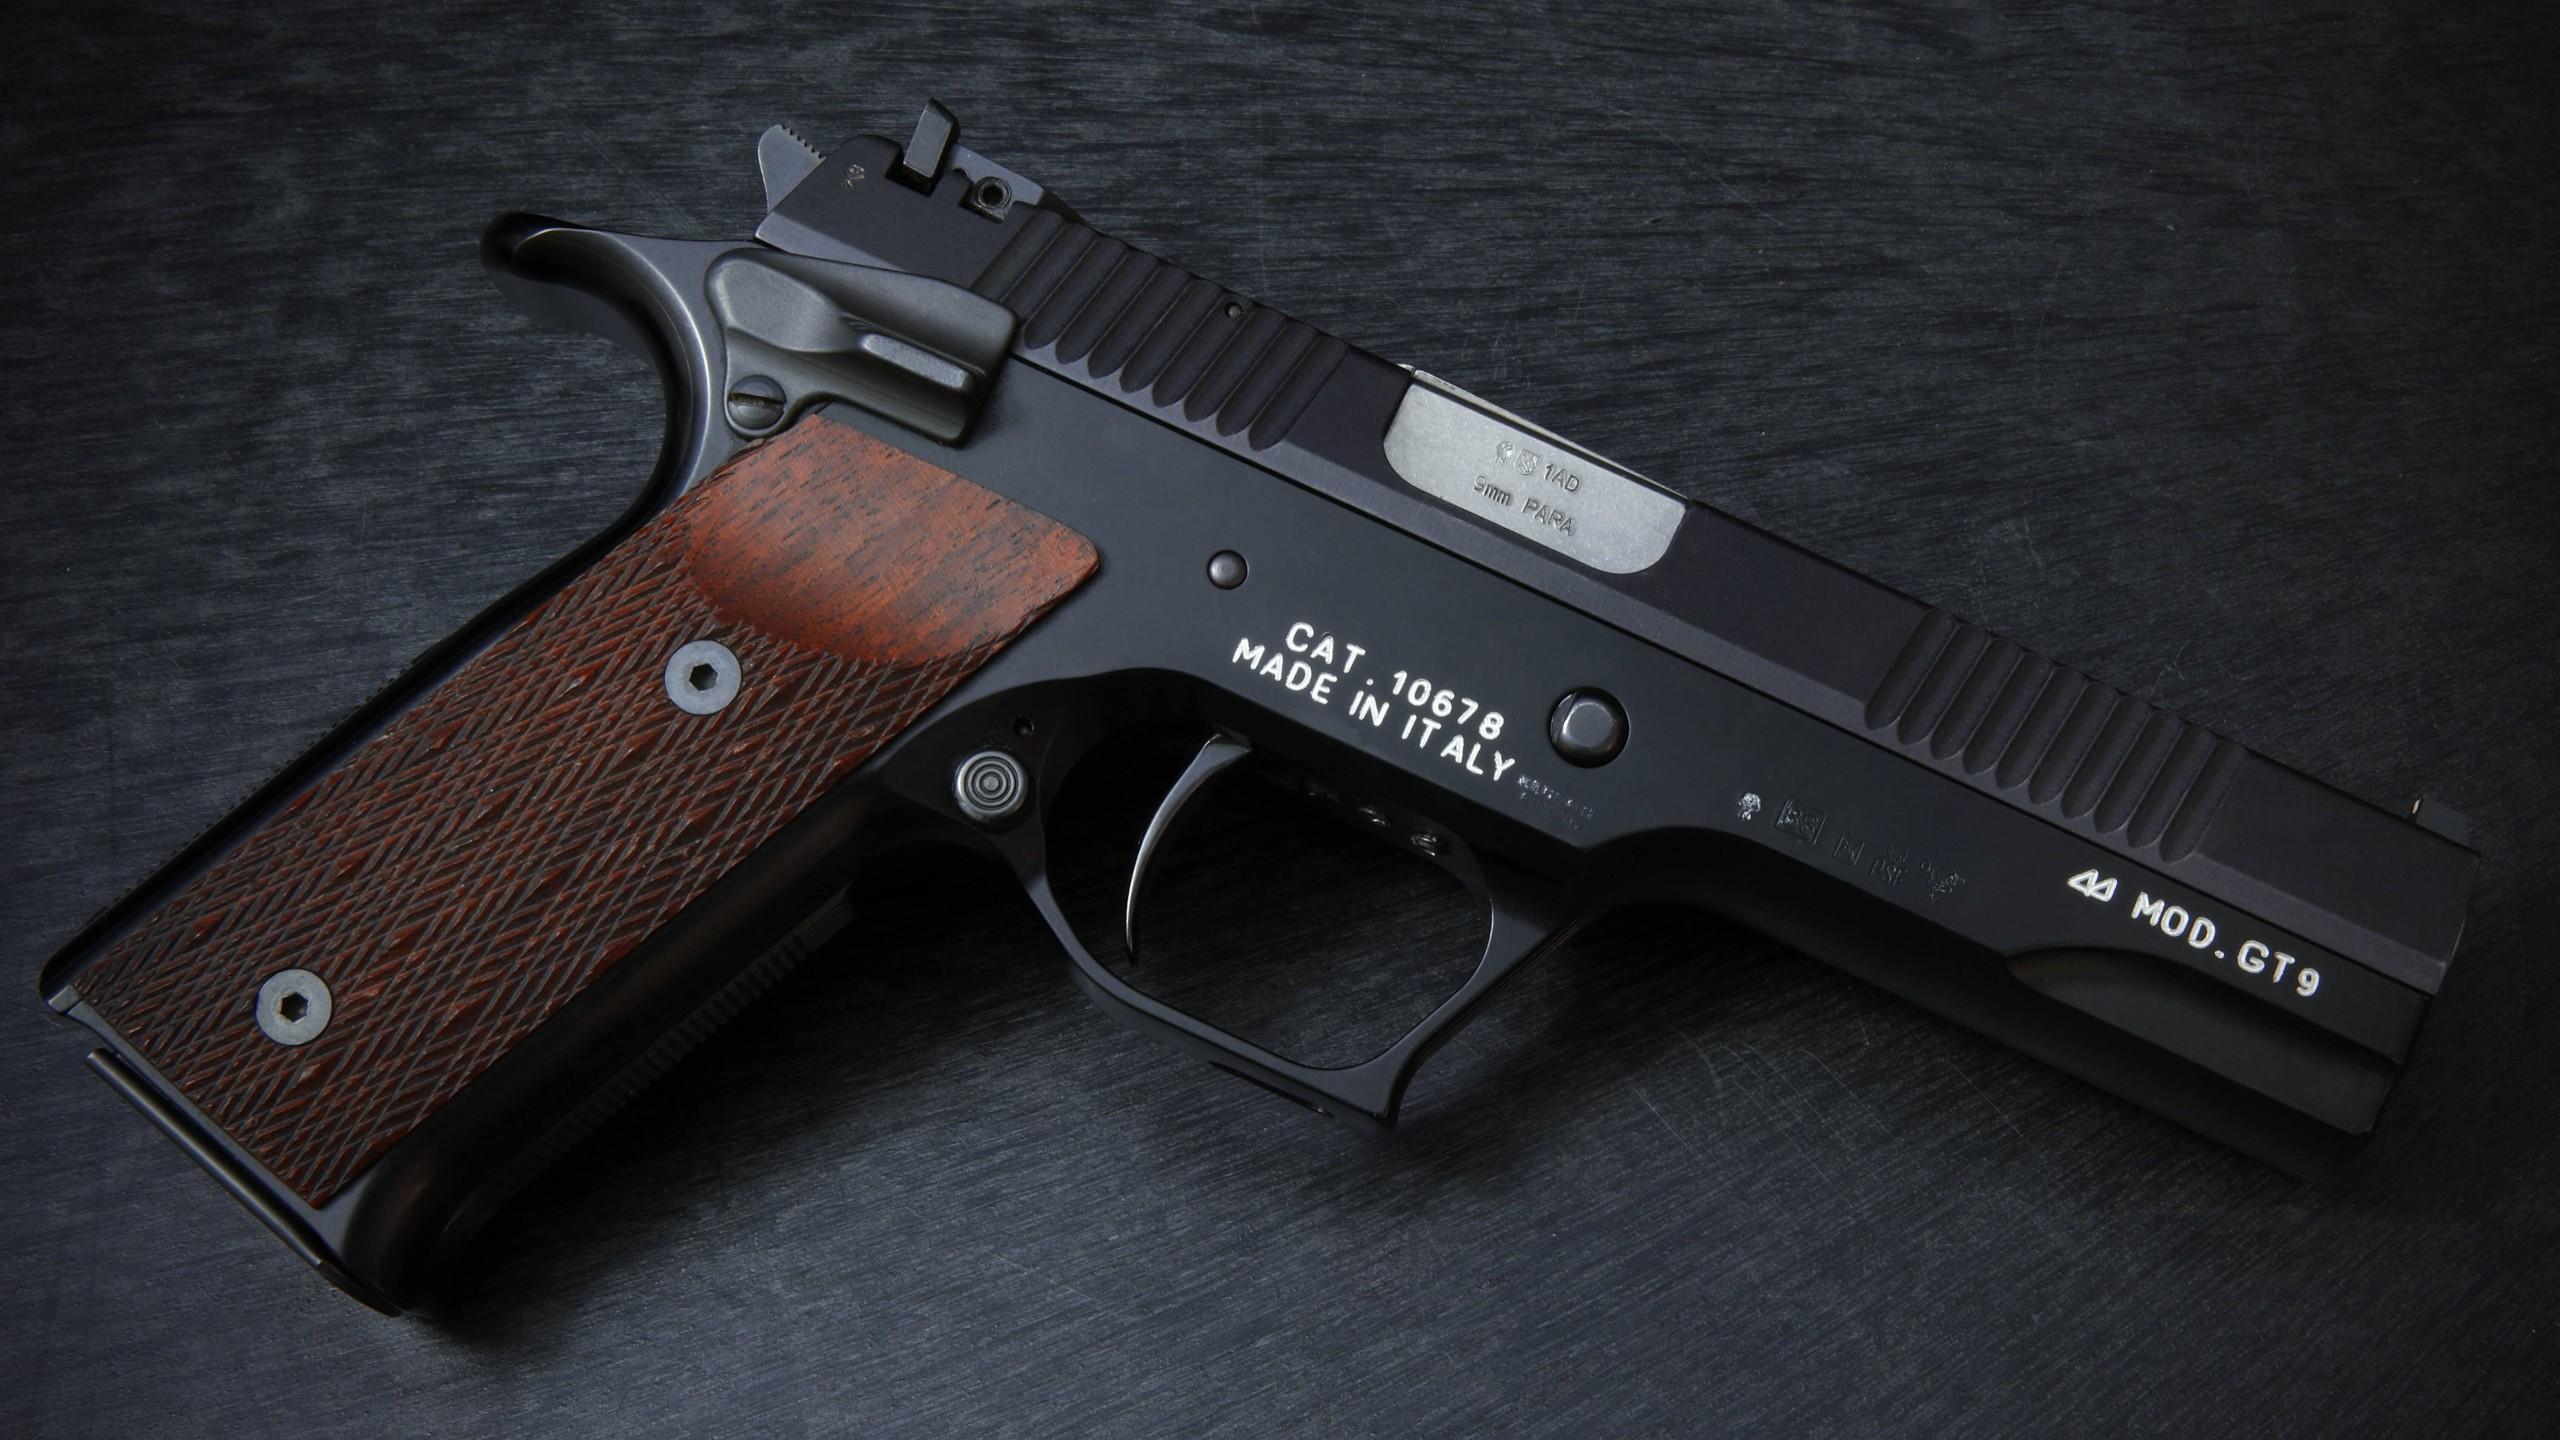 General 2560x1440 gun pistol Pardini GT9 Sporting pistol Target pistol